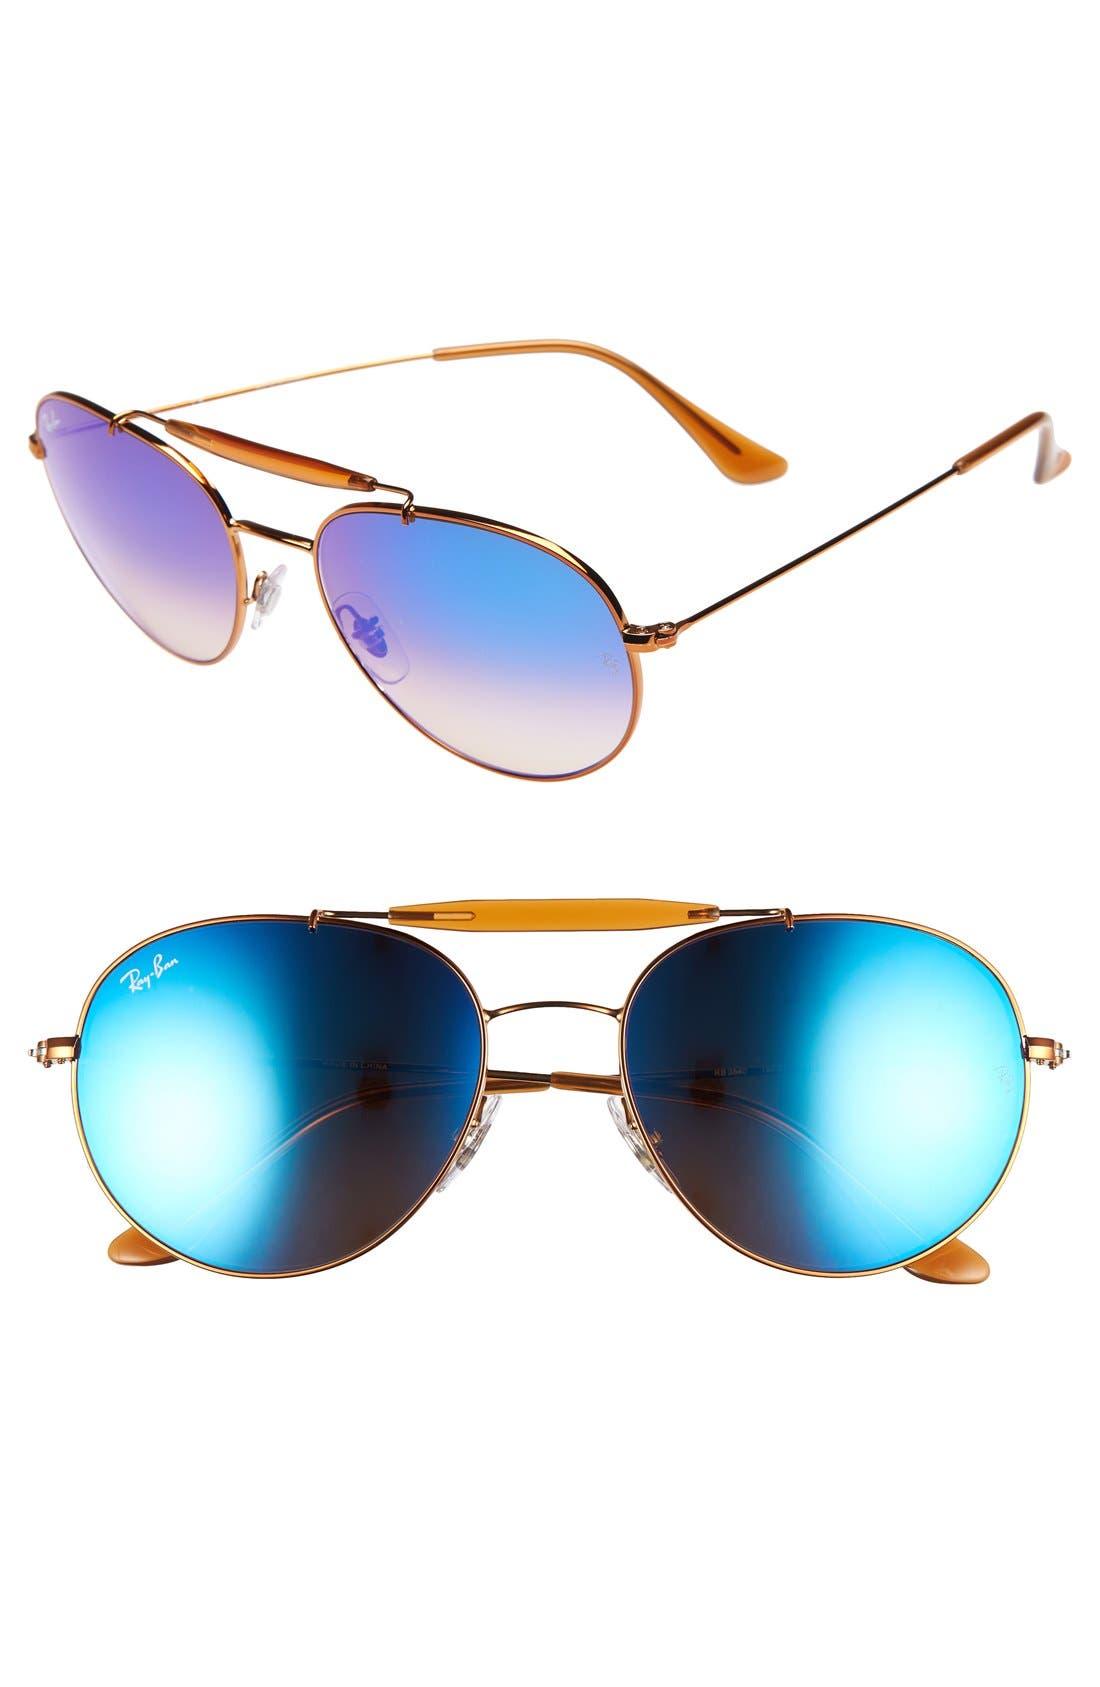 Highstreet 56mm Sunglasses,                         Main,                         color, Medium Blue Flash